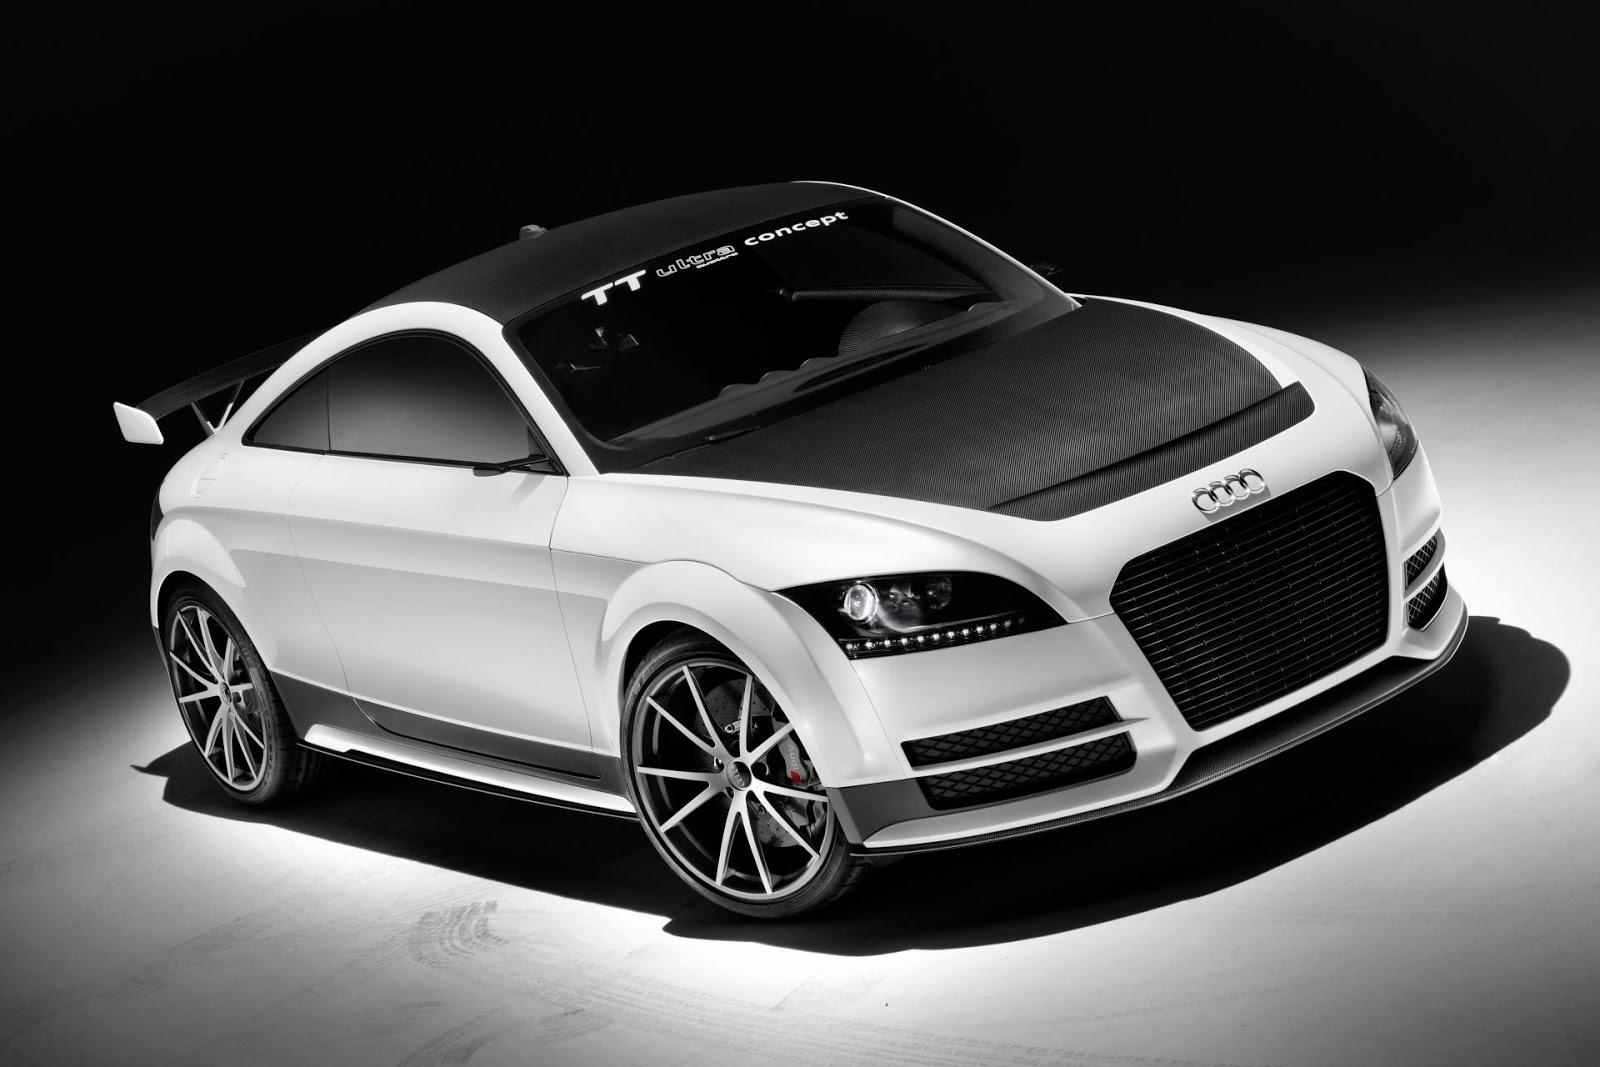 audi tt ultra quattro concept 2013 hottest car. Black Bedroom Furniture Sets. Home Design Ideas